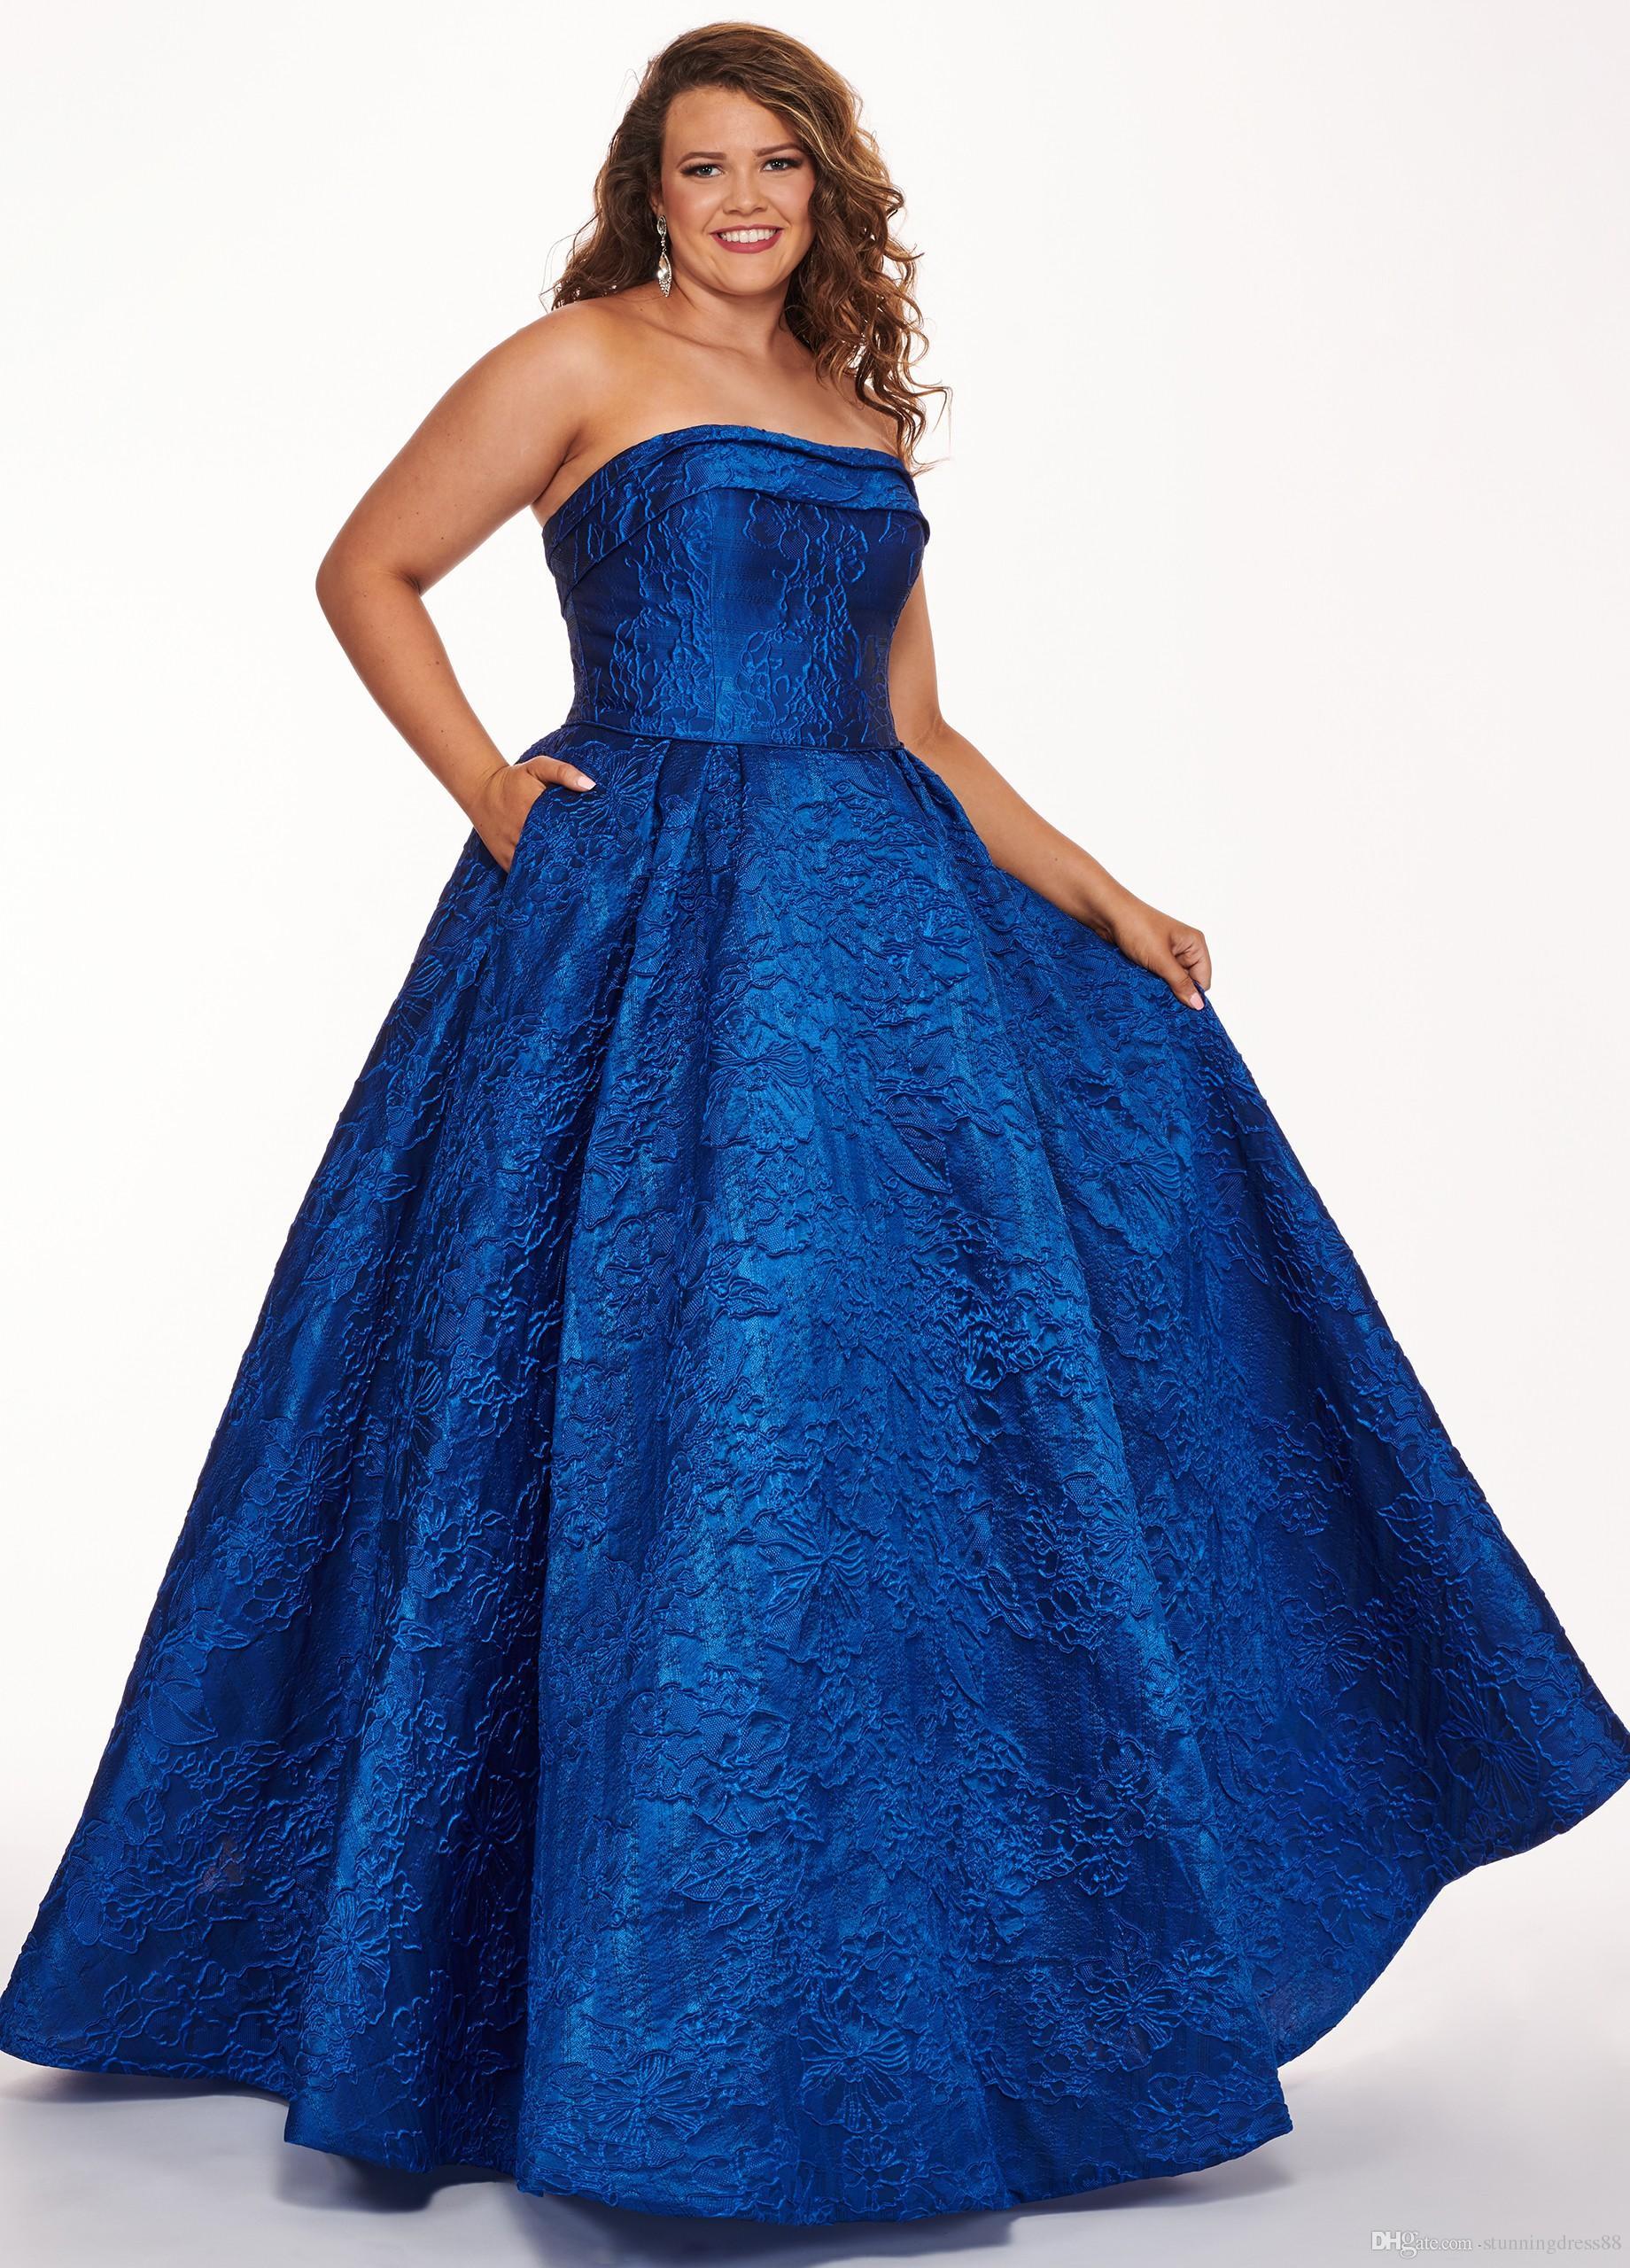 Abend Cool Abendkleid Plus Size Spezialgebiet13 Großartig Abendkleid Plus Size Boutique